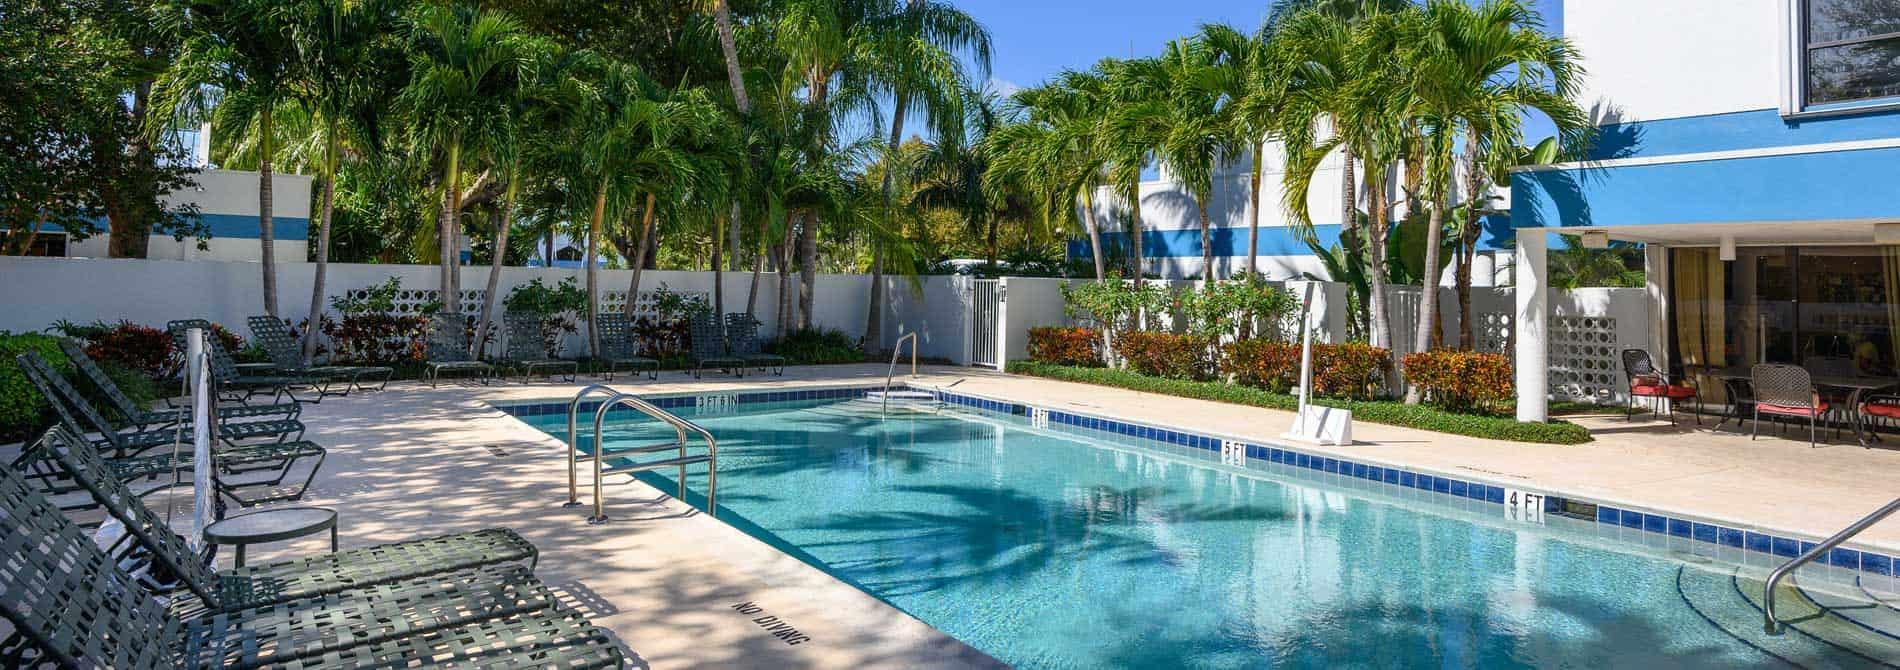 West Palm Beach Residential Opioid Treatment Programs